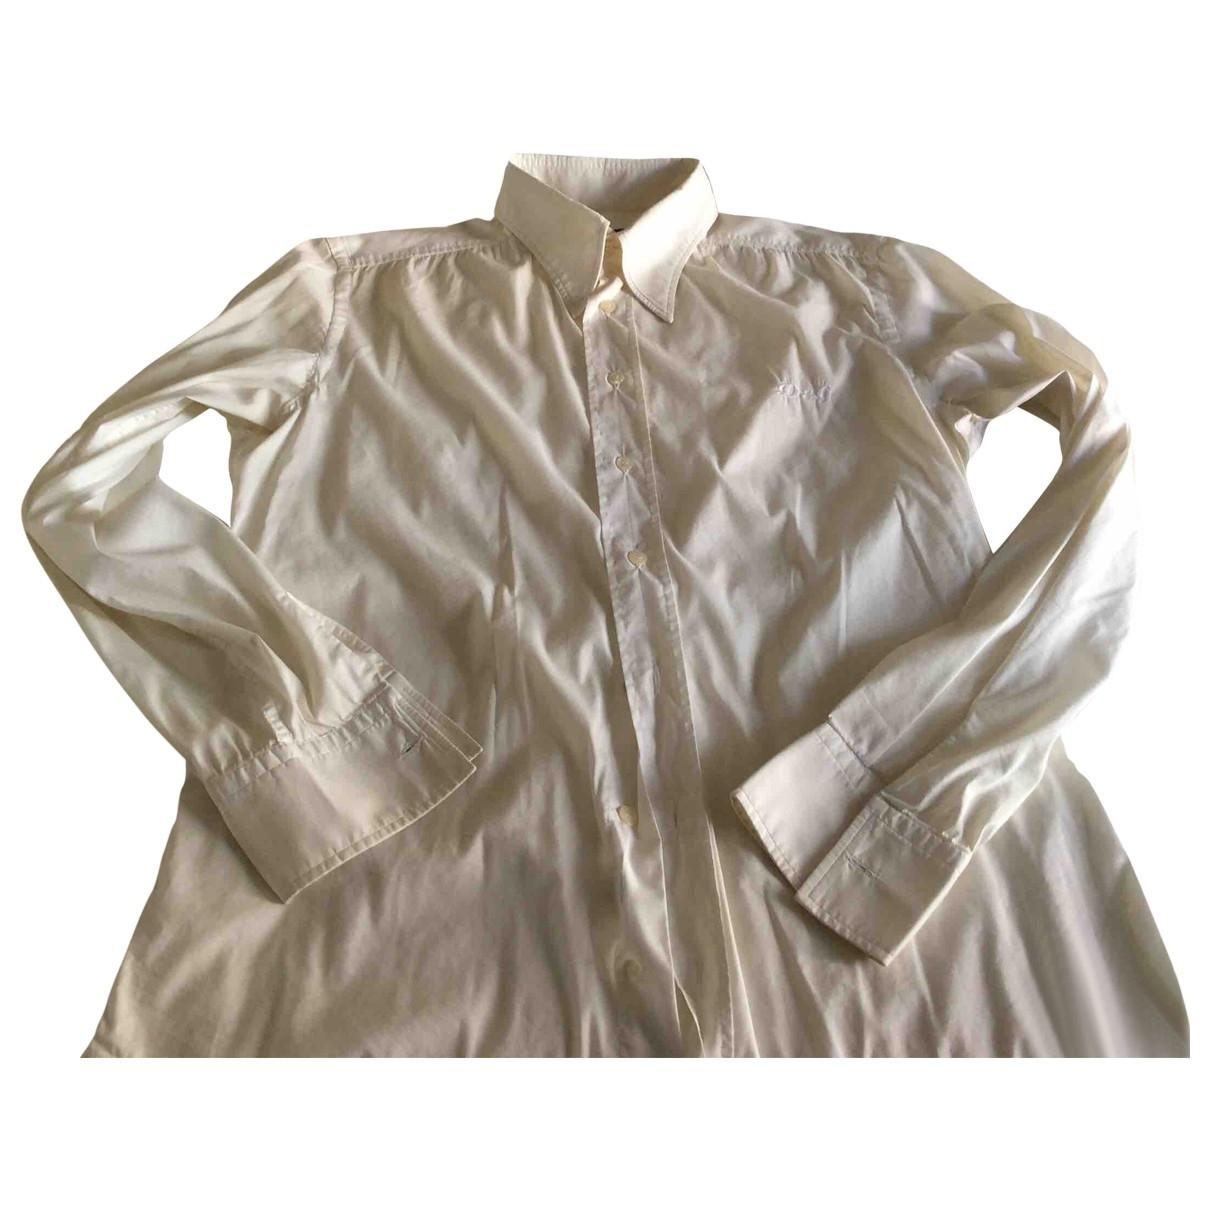 D&g \N Beige Cotton Shirts for Men L International